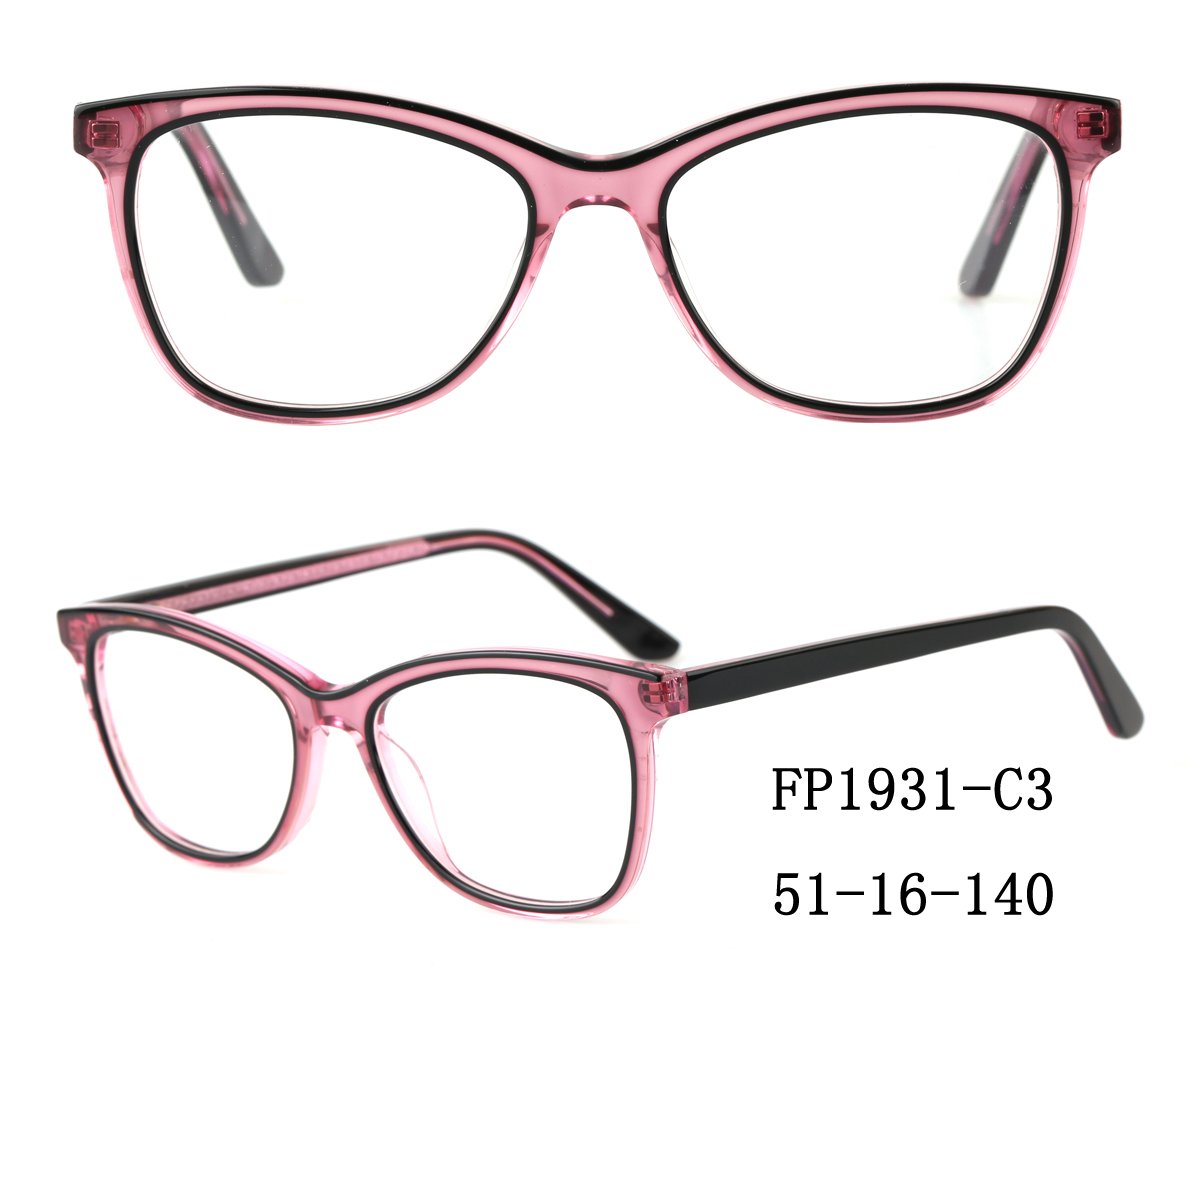 Handmade Acetate Eyeglass Frames In Stock-Popeyewear